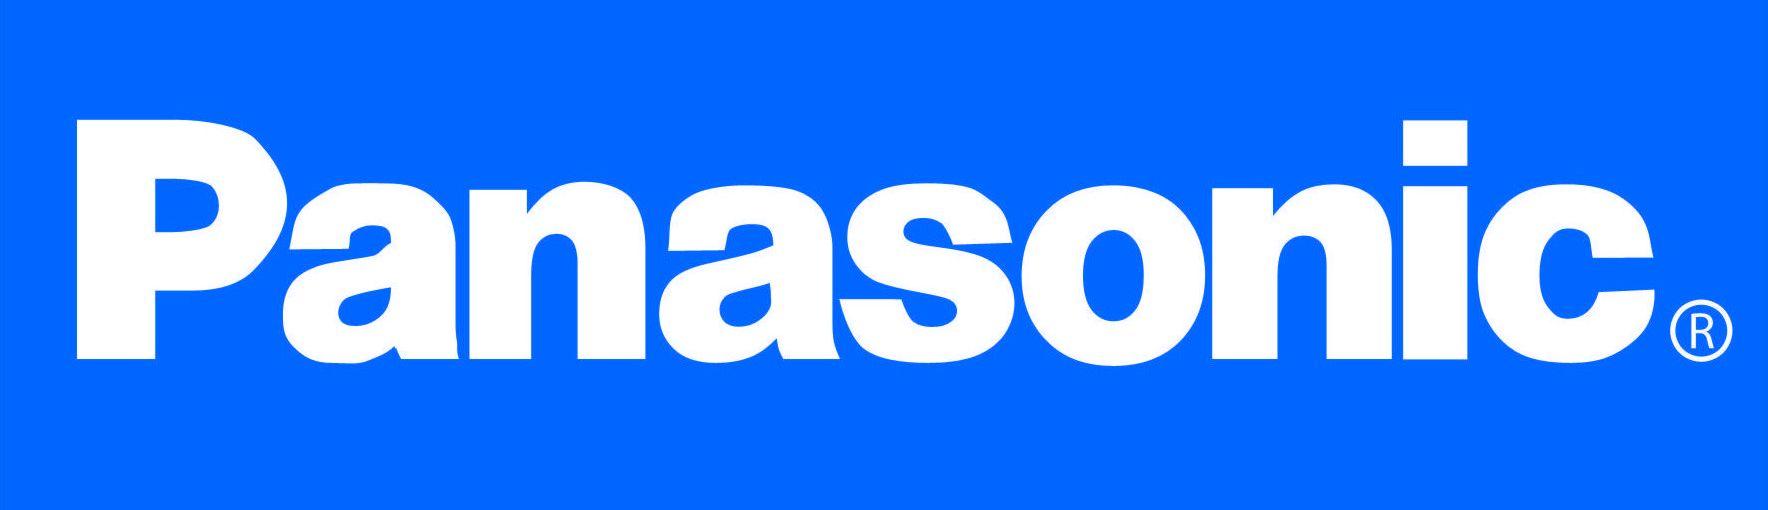 Panasonic logos